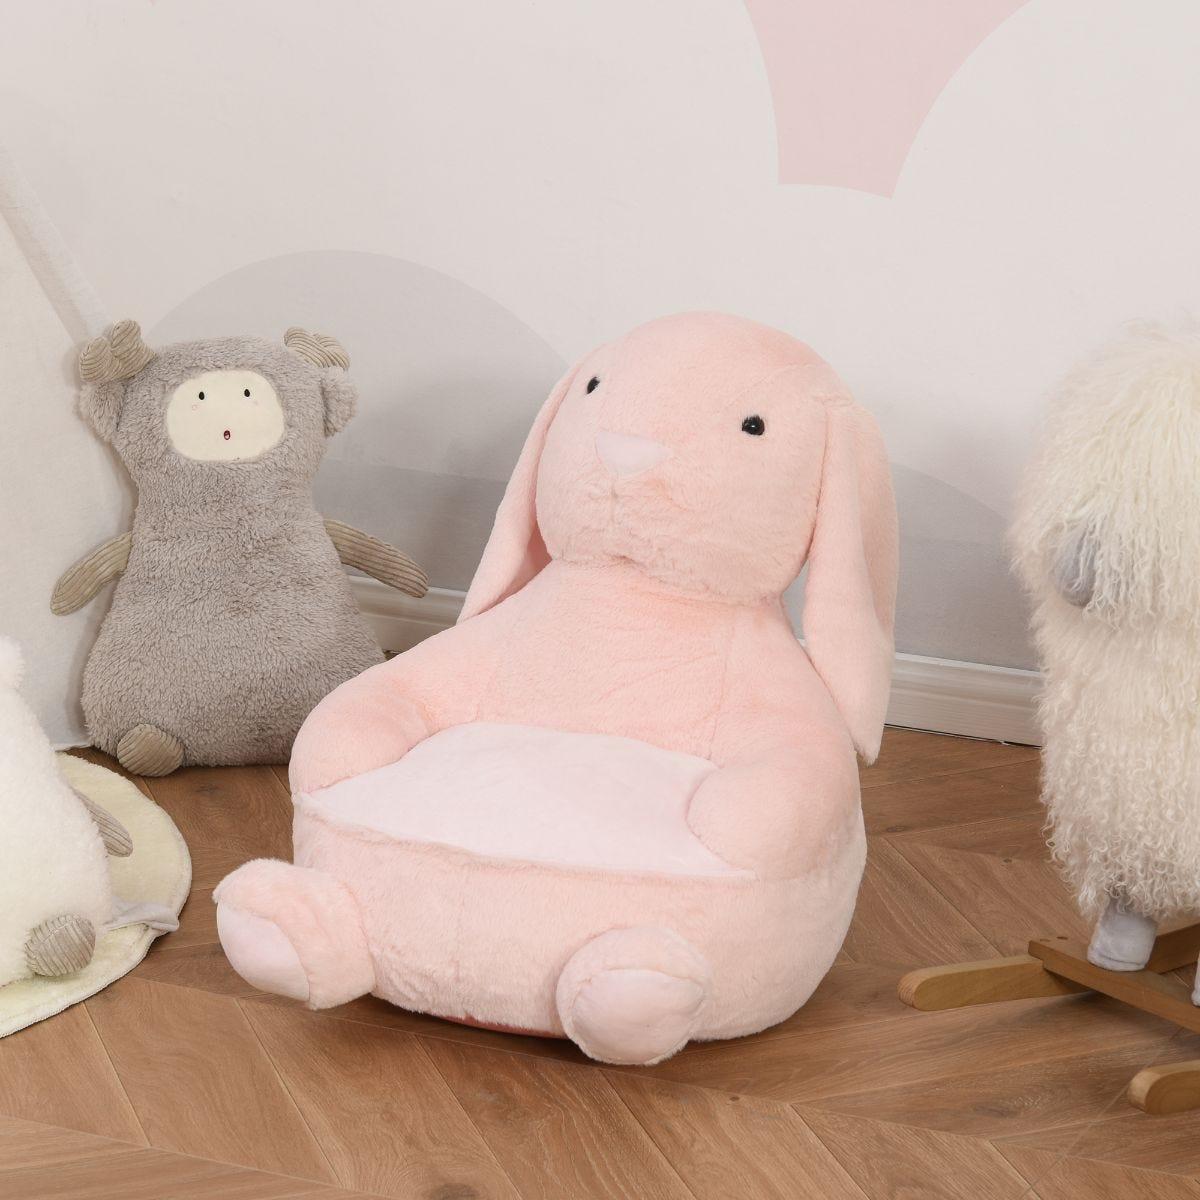 Kids Animal Rabbit Cartoon Soft Chair with Armrest 60x50x59cm Pink